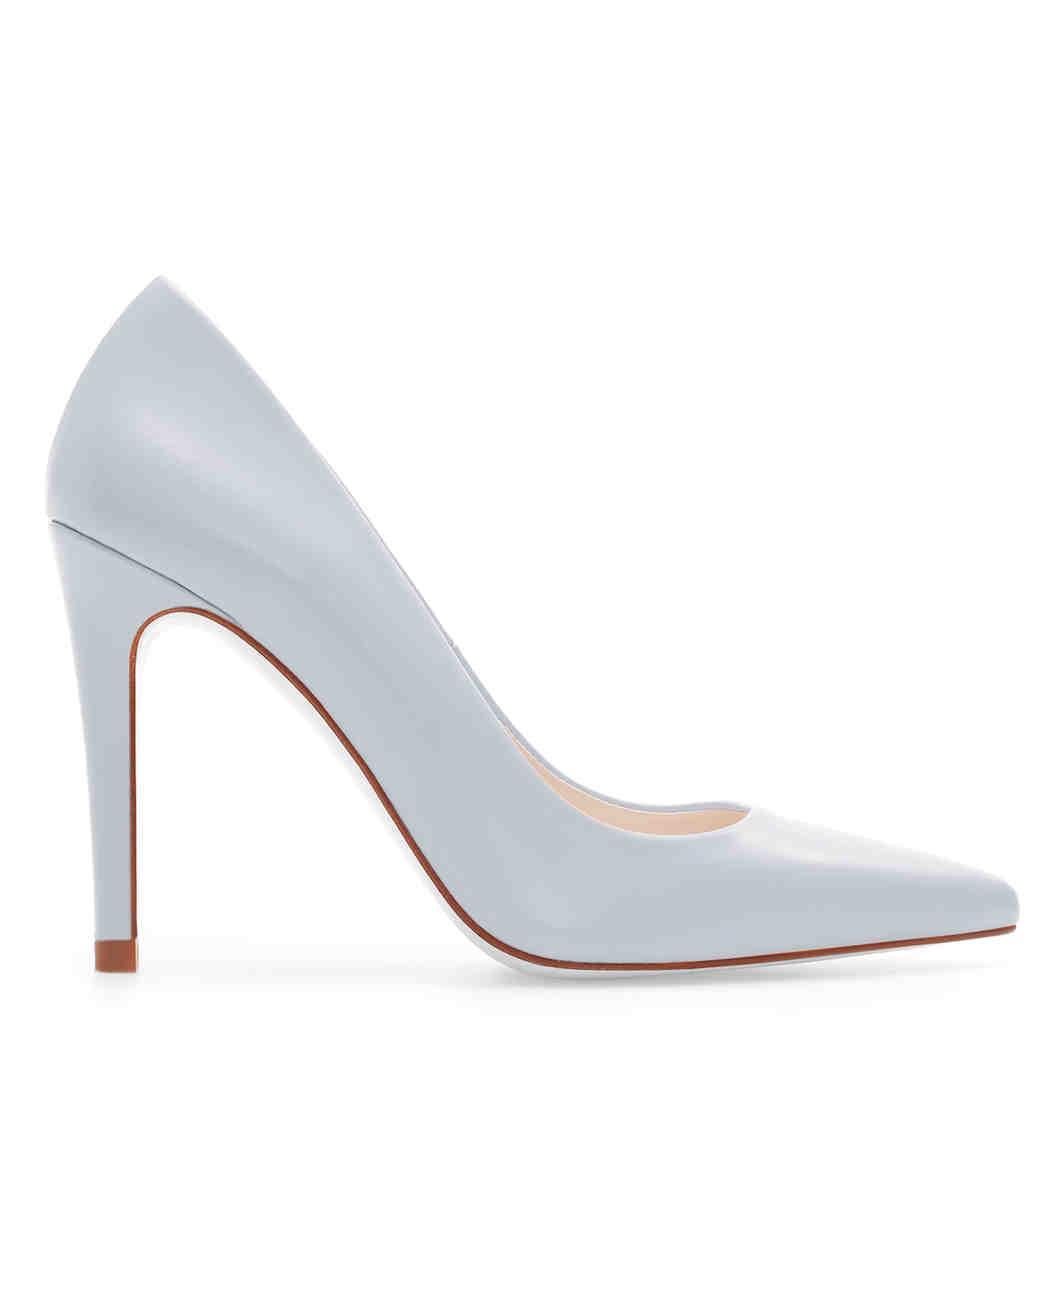 zara-shoes-msw-fall13.jpg